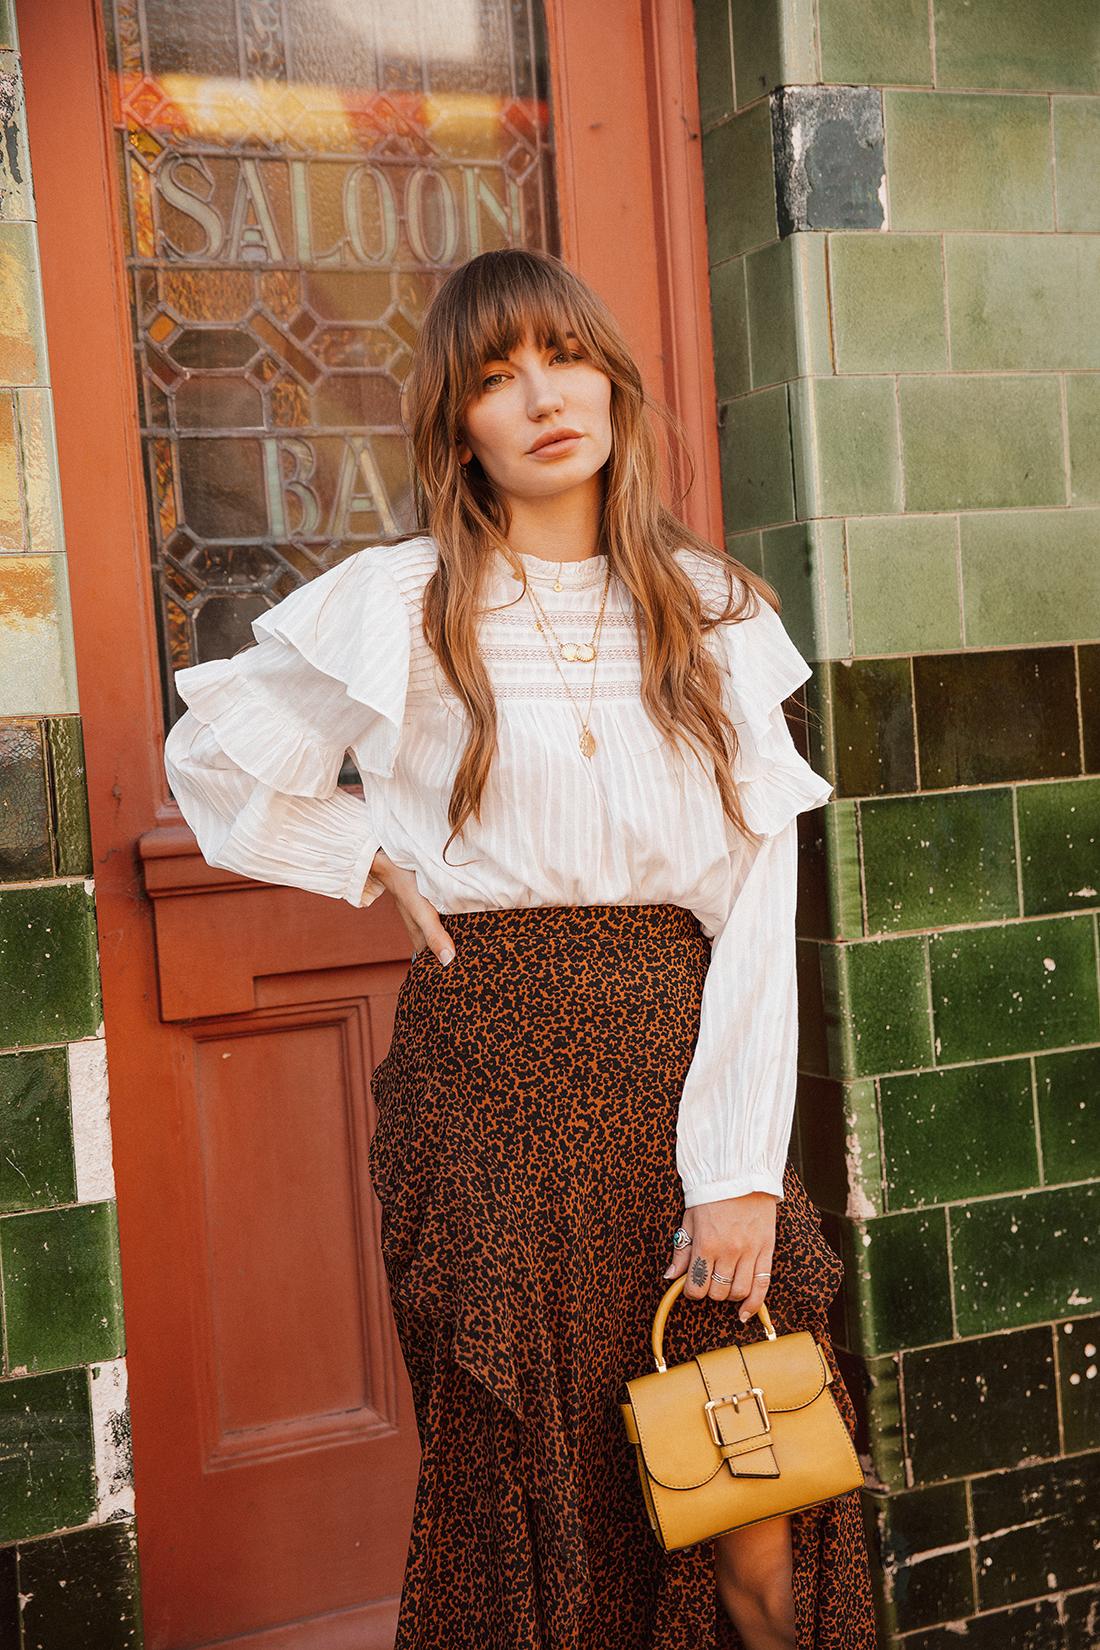 Blogger fashion photoshoot of Sara Waiste by London photographer Ailera Stone